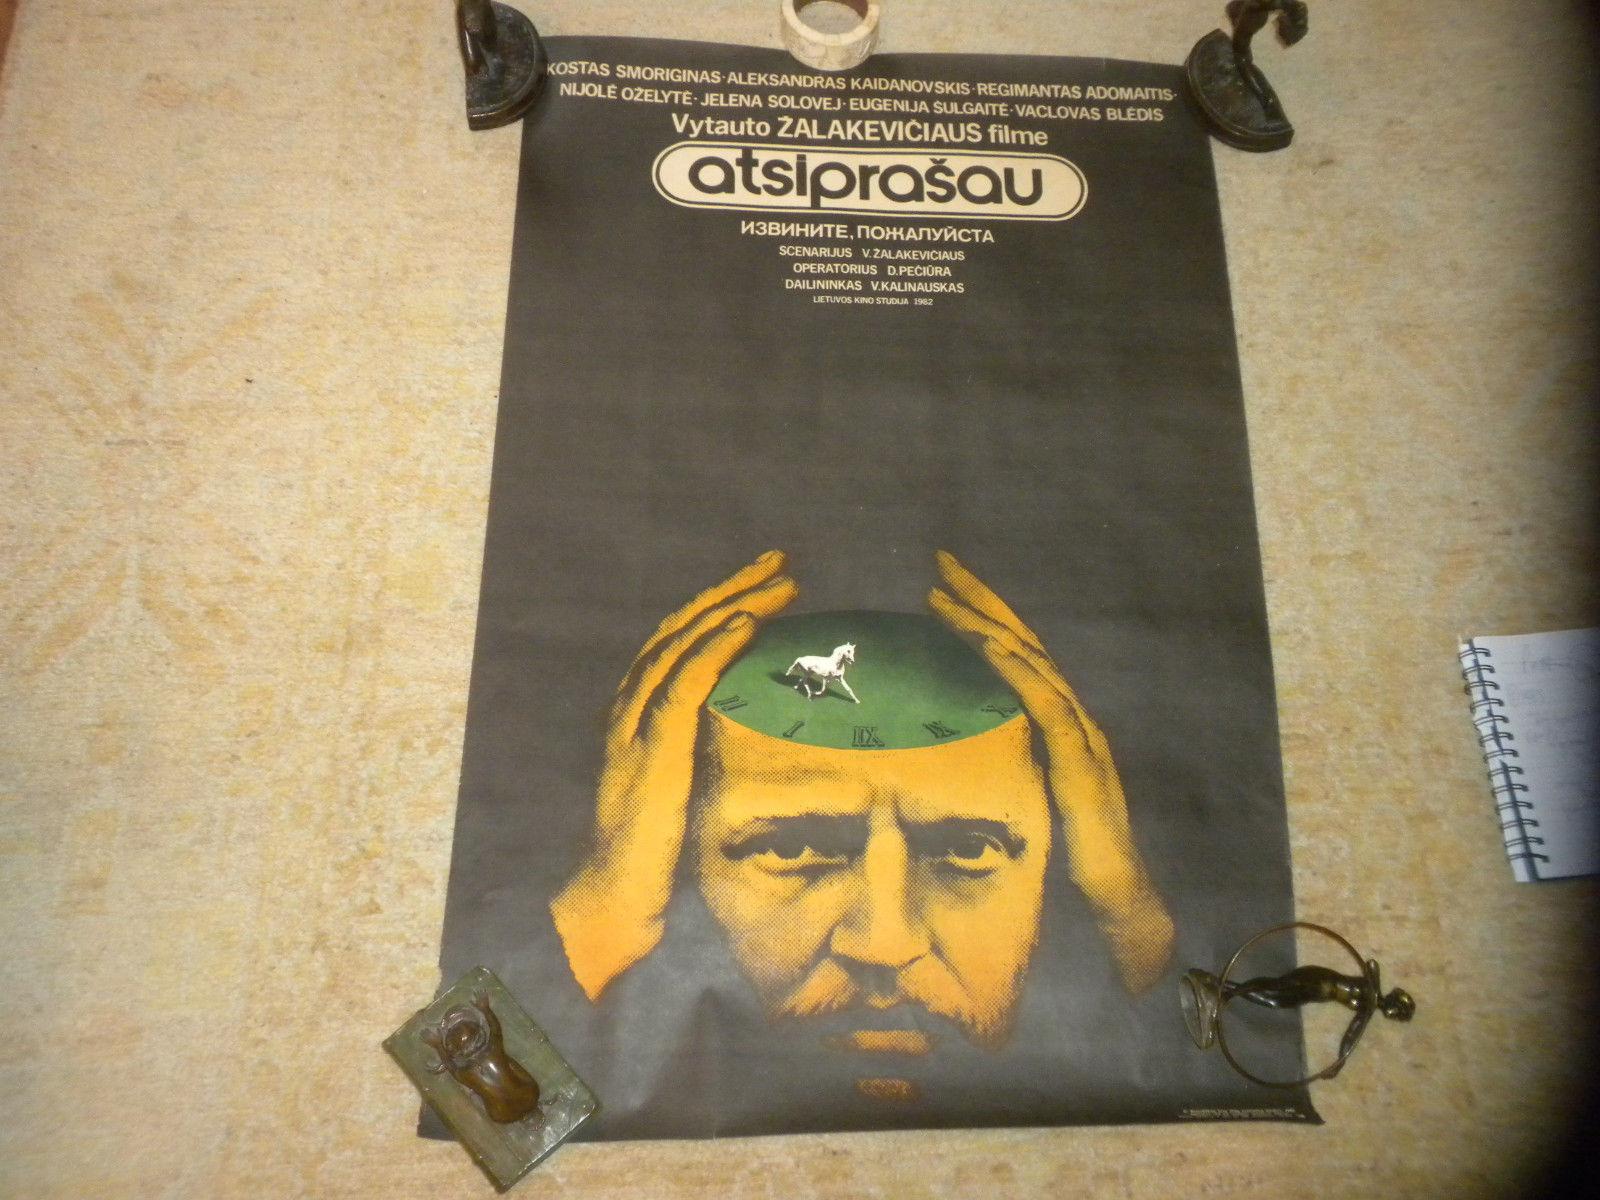 "original Lithuanian Film Poster Forgive Me (Atsiprasau) 23"" x 35""  1983 VG"